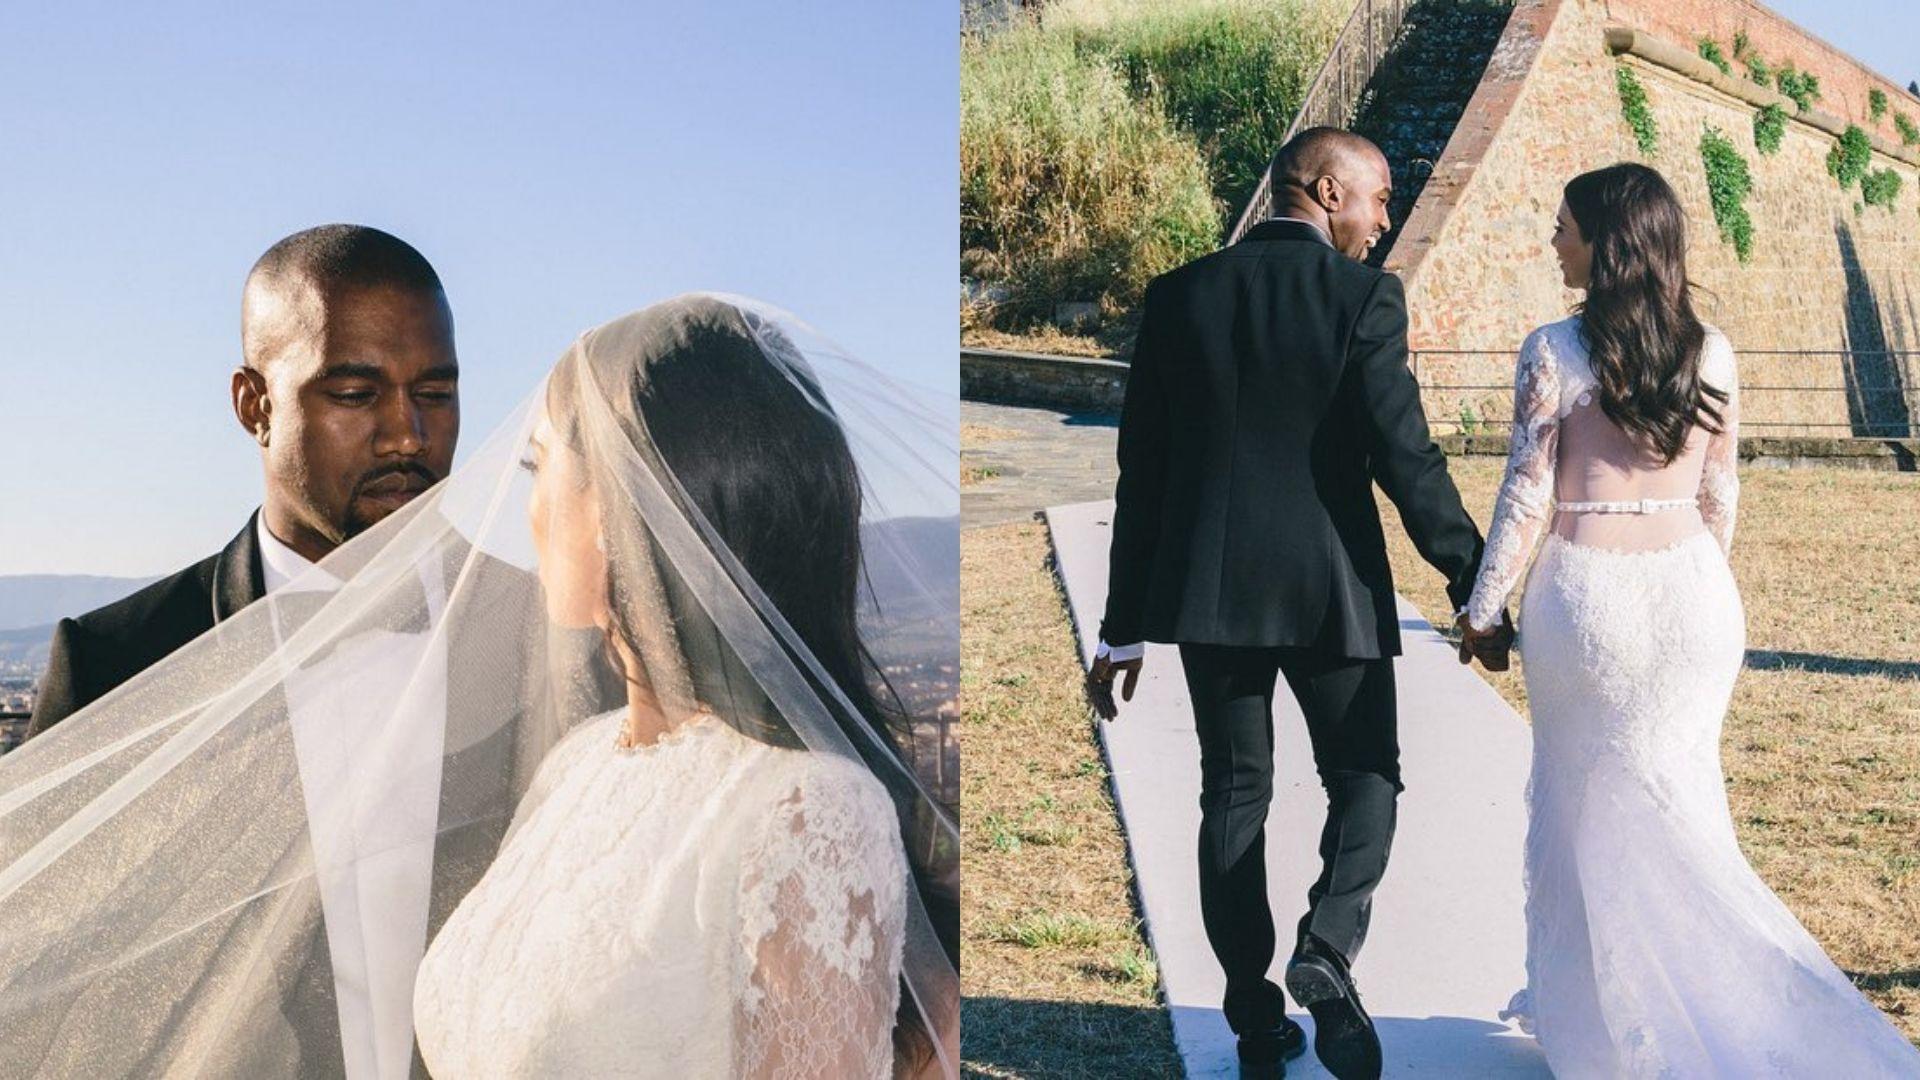 Kim Kardashian And Kanye West Just Renewed Their Wedding Vows In